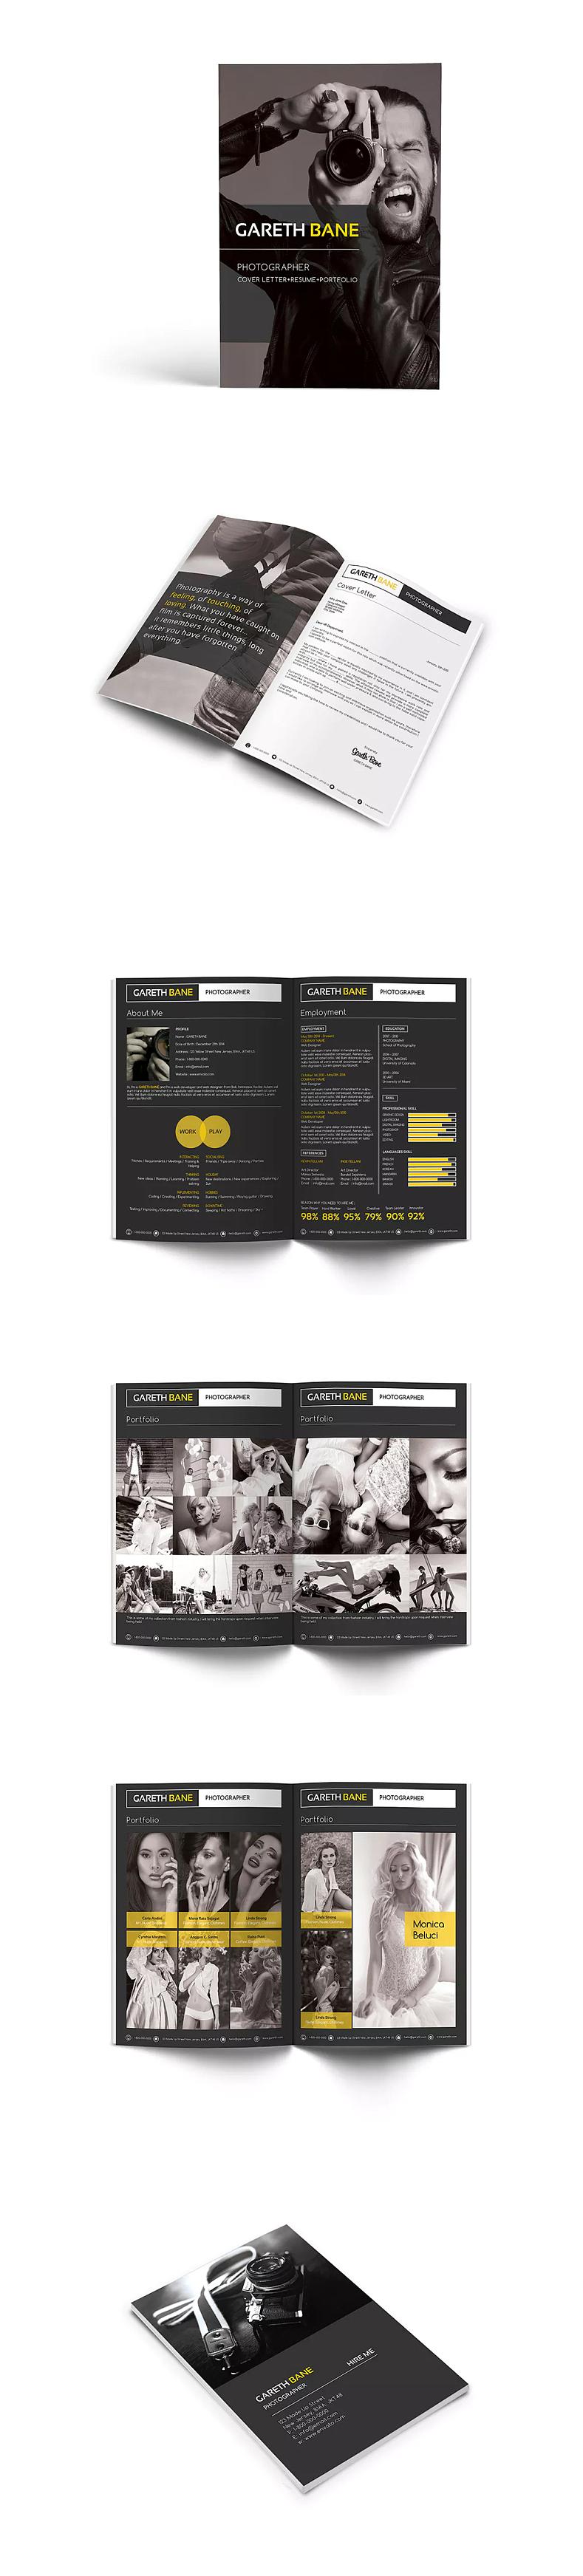 53tao毕业设计作品集模板产品目录宣传画册图册排版id图片